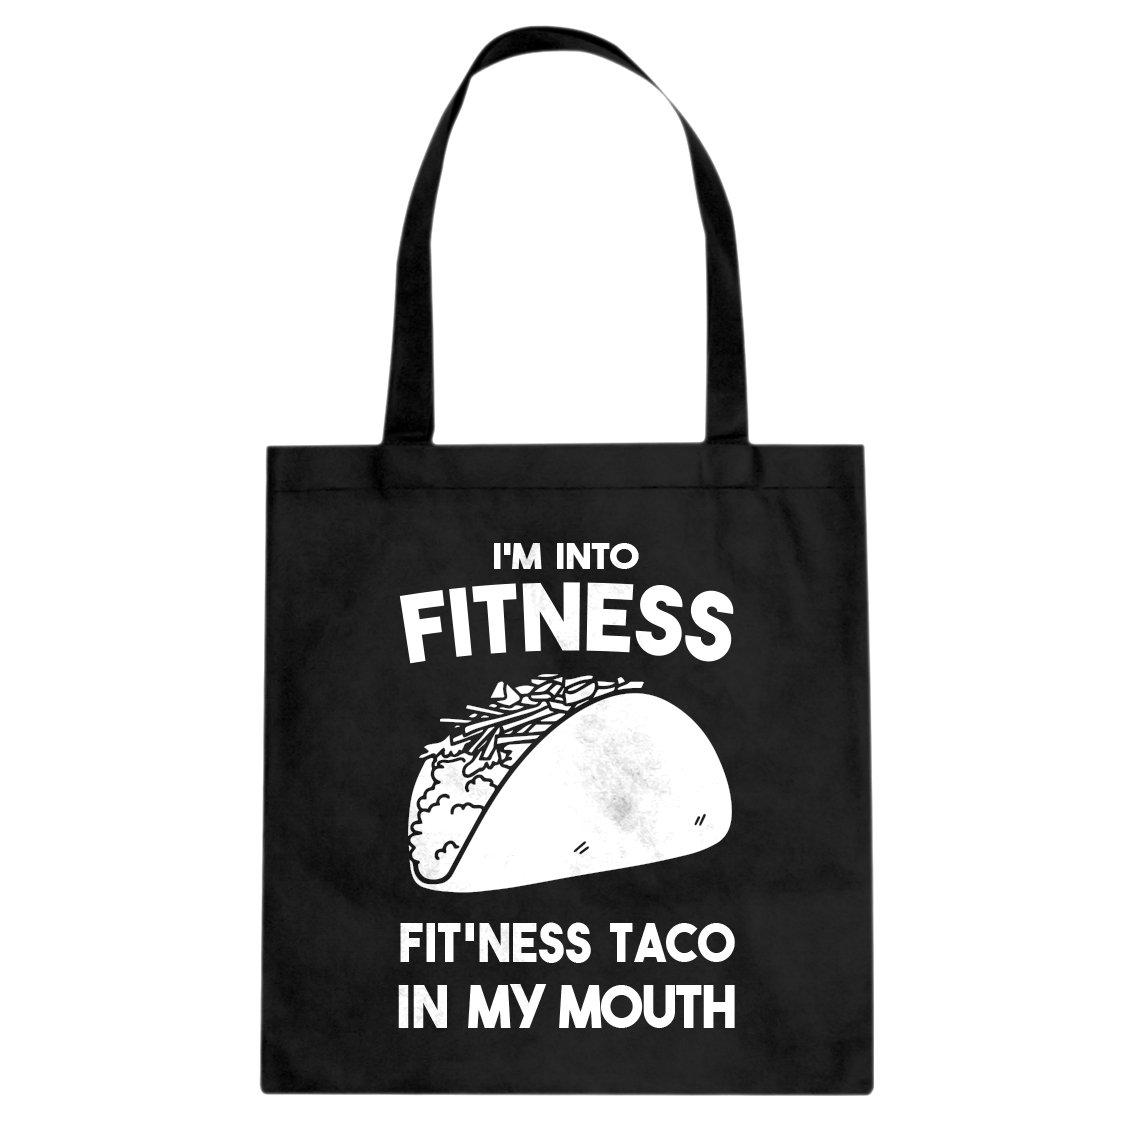 Indica Plateau Fitness Taco Cotton Canvas Tote Bag